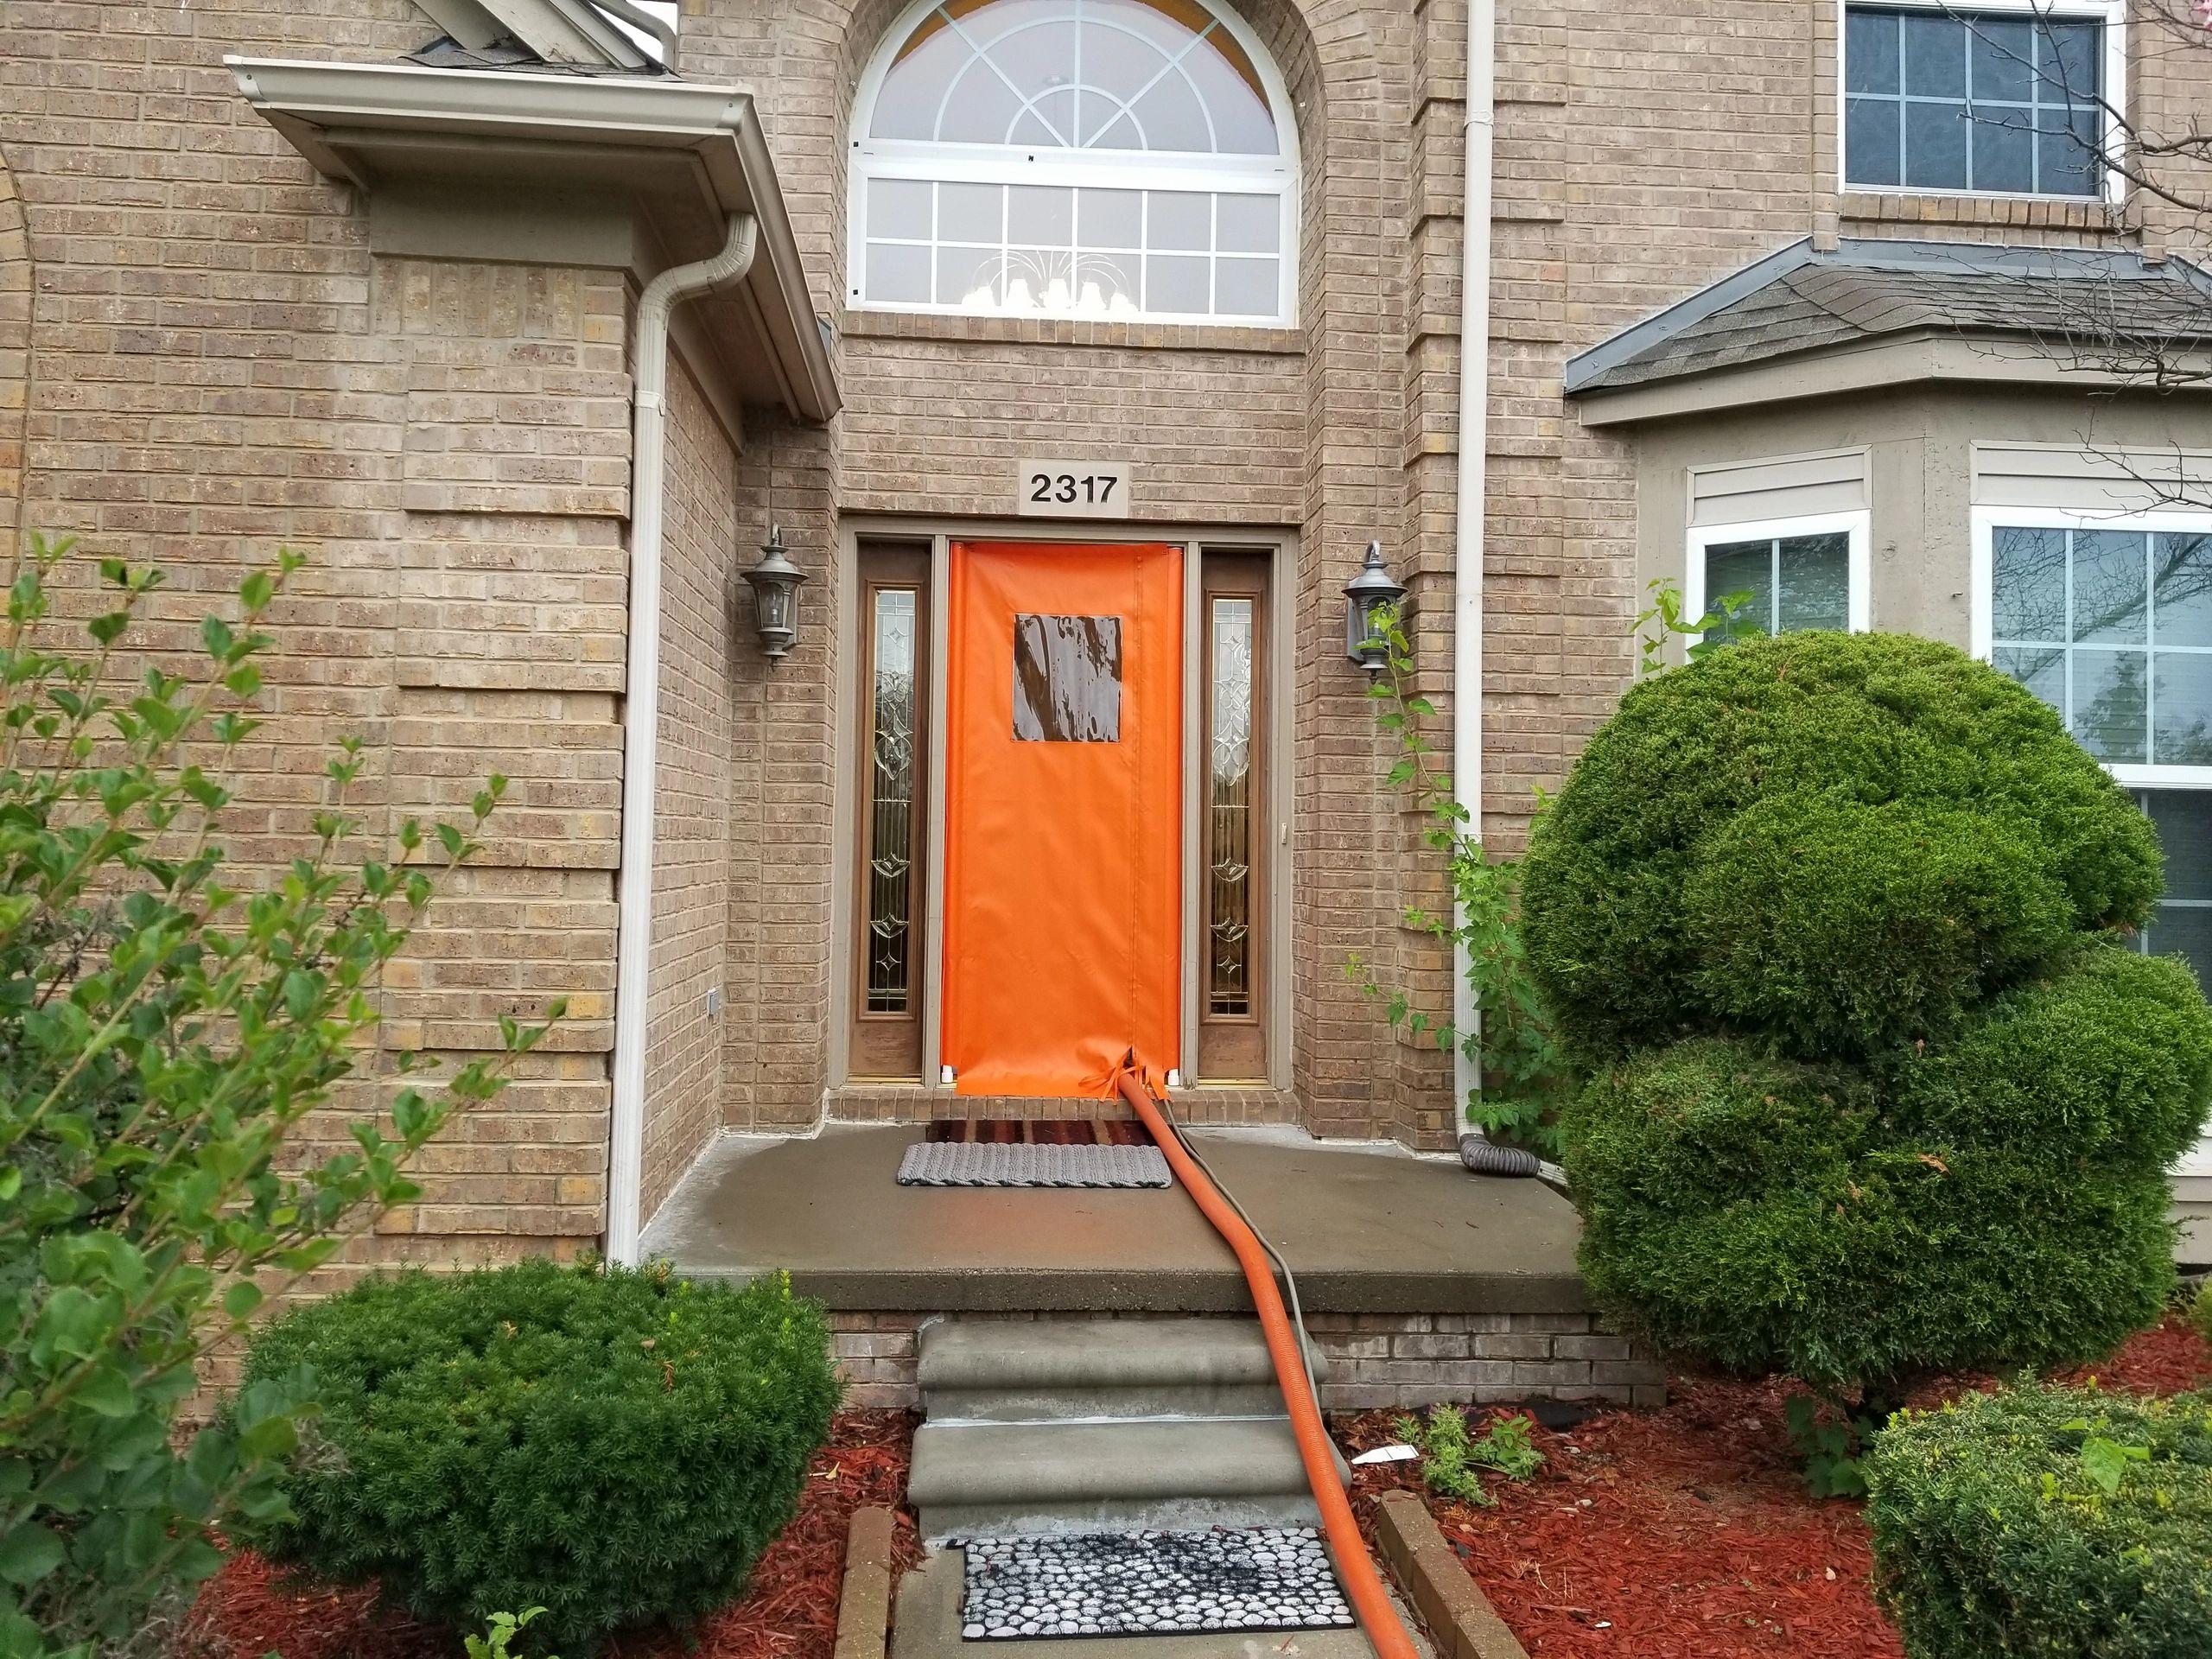 SEAL Canvas Products - Door Enclosure, Door Seal, Cleaning Supplies